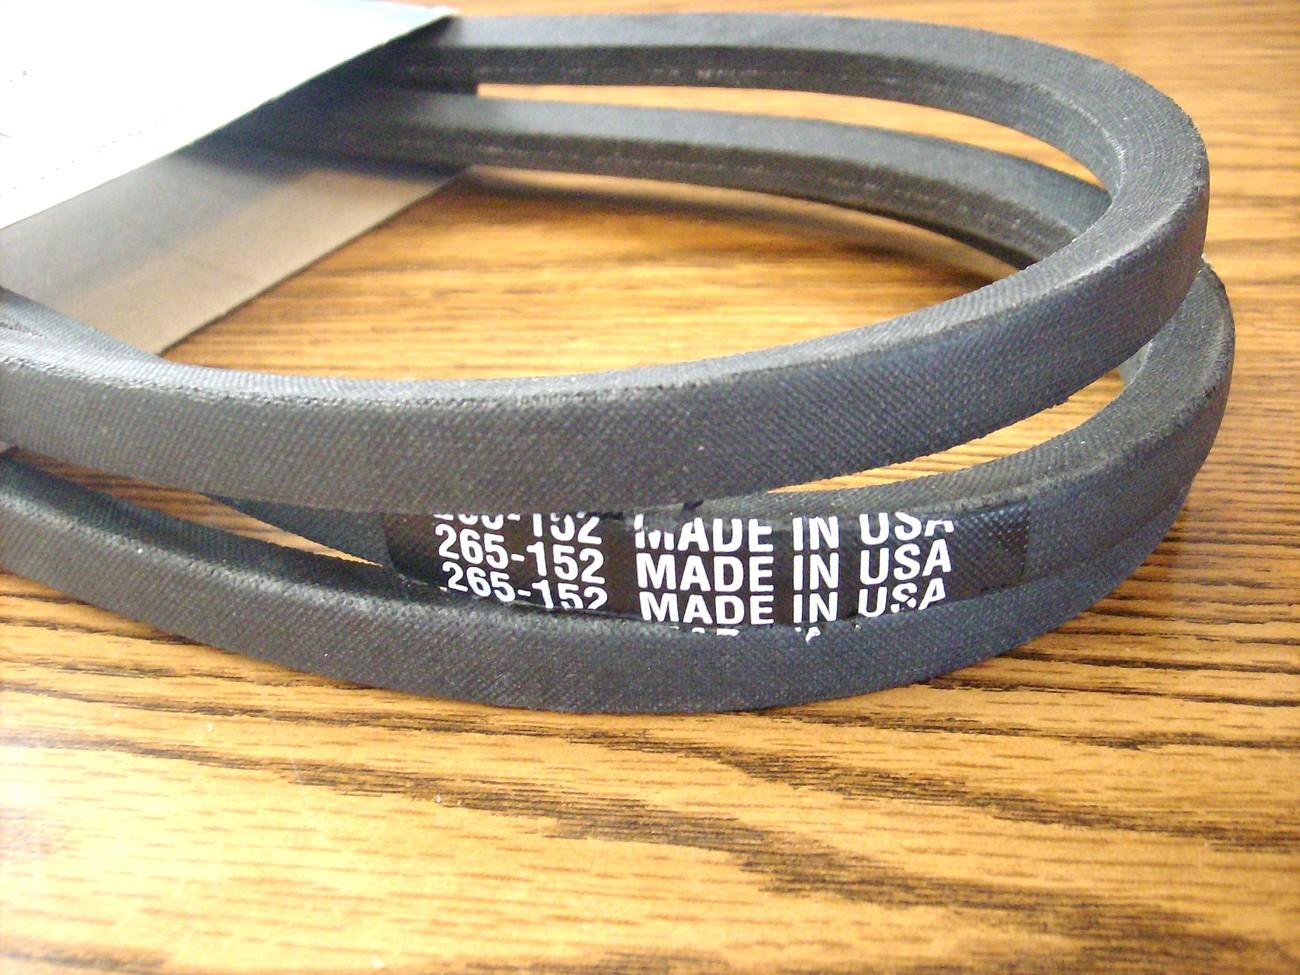 Craftsman Lawn Mower Belts : Ariens craftsman husqvarna lawn mower deck belt